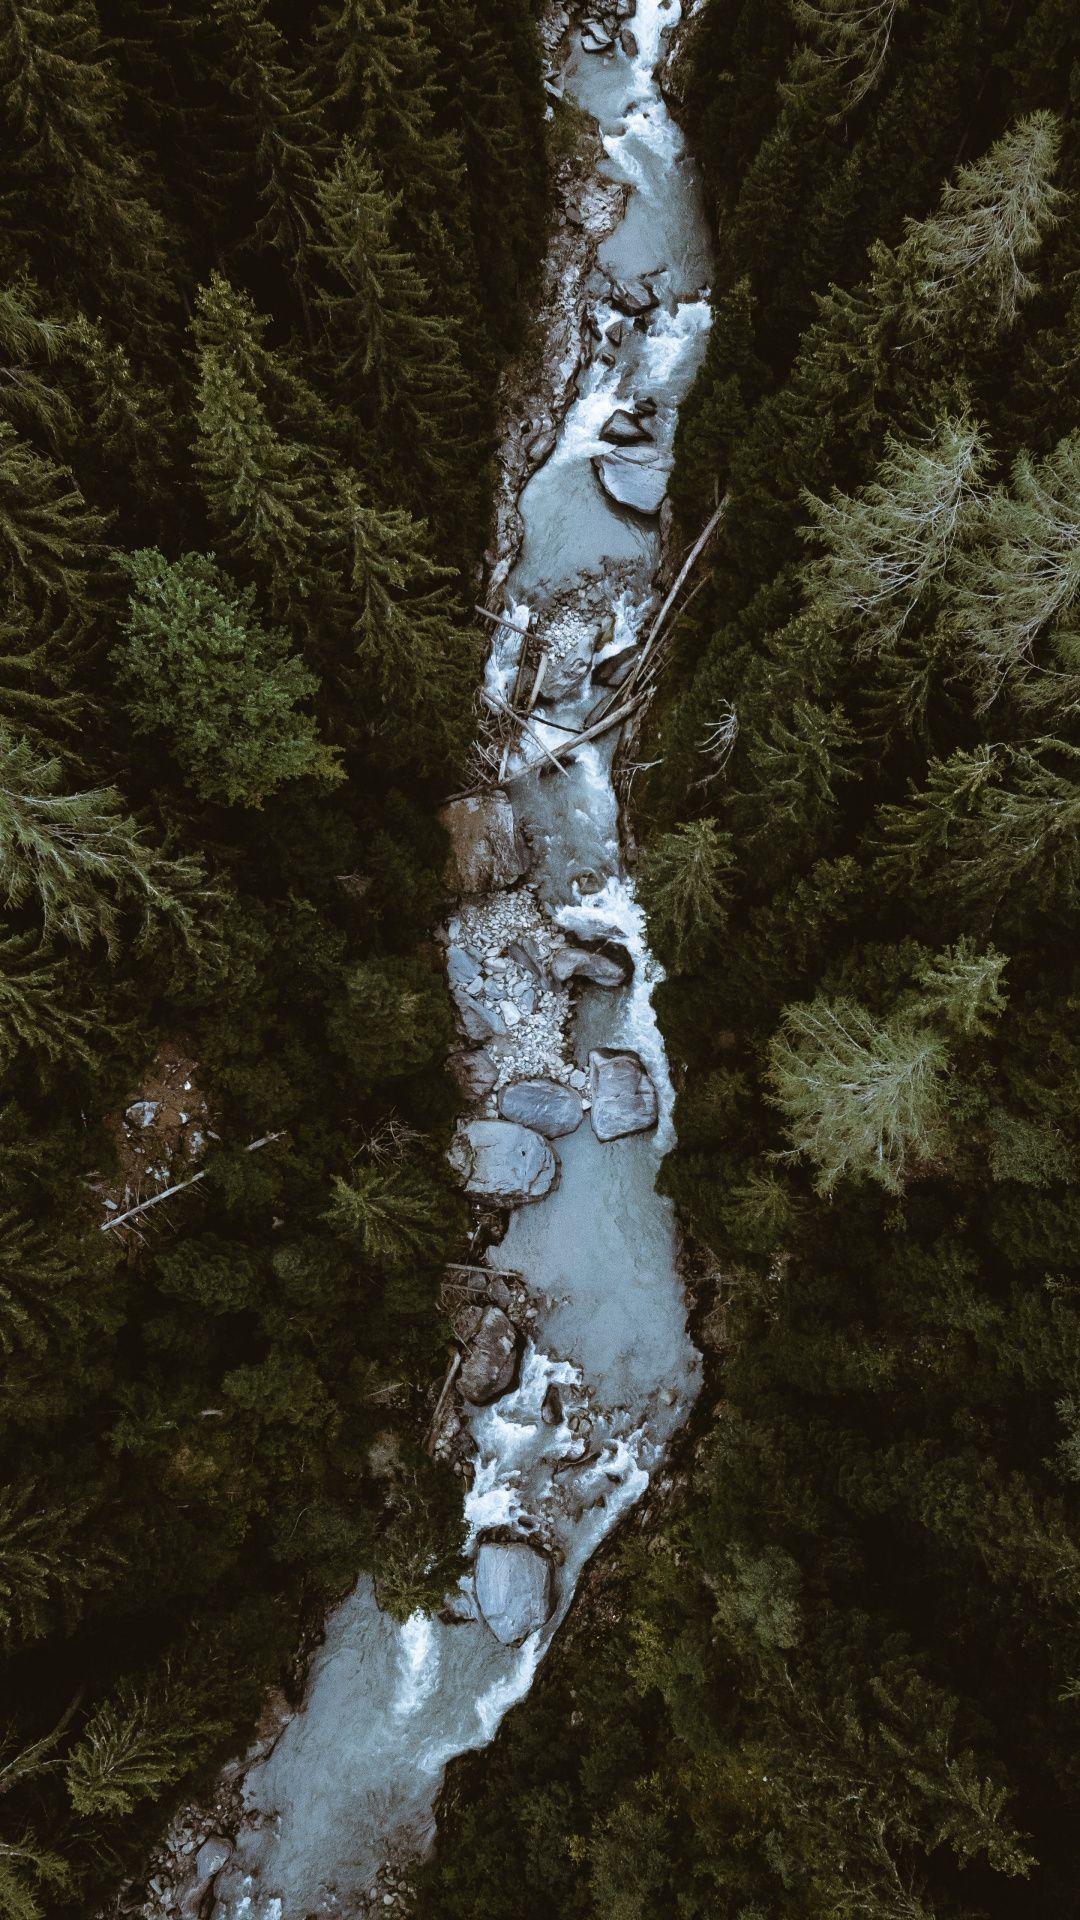 River, water current, bird eye view, Swiss, 1080x1920